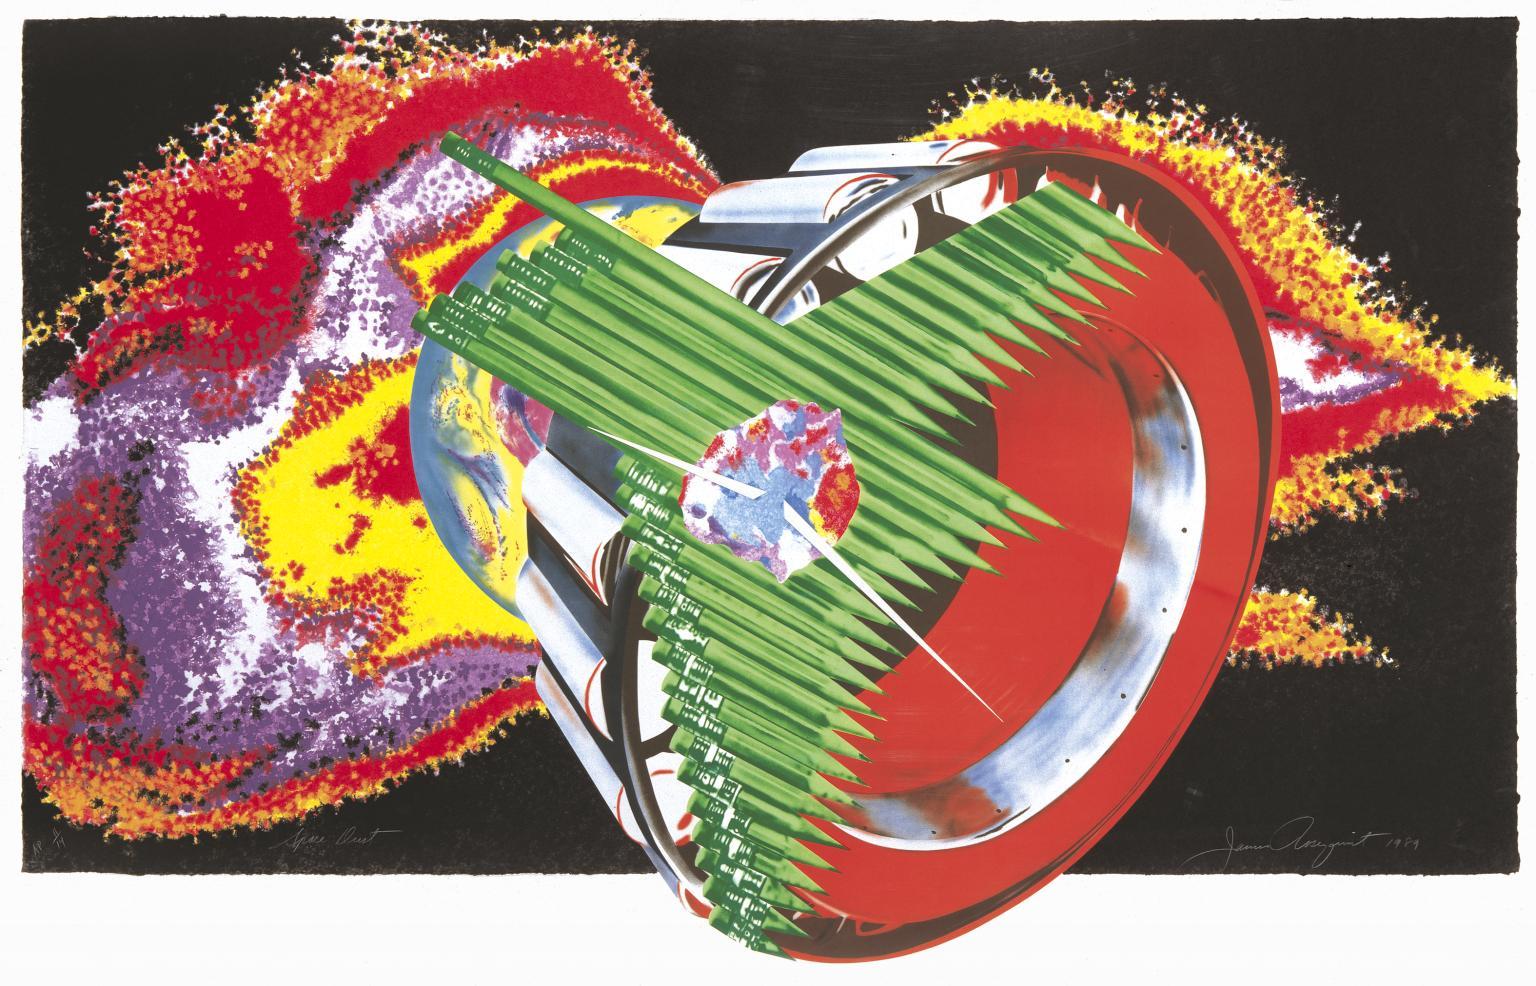 James Rosenquist,  Space Dust , 1989